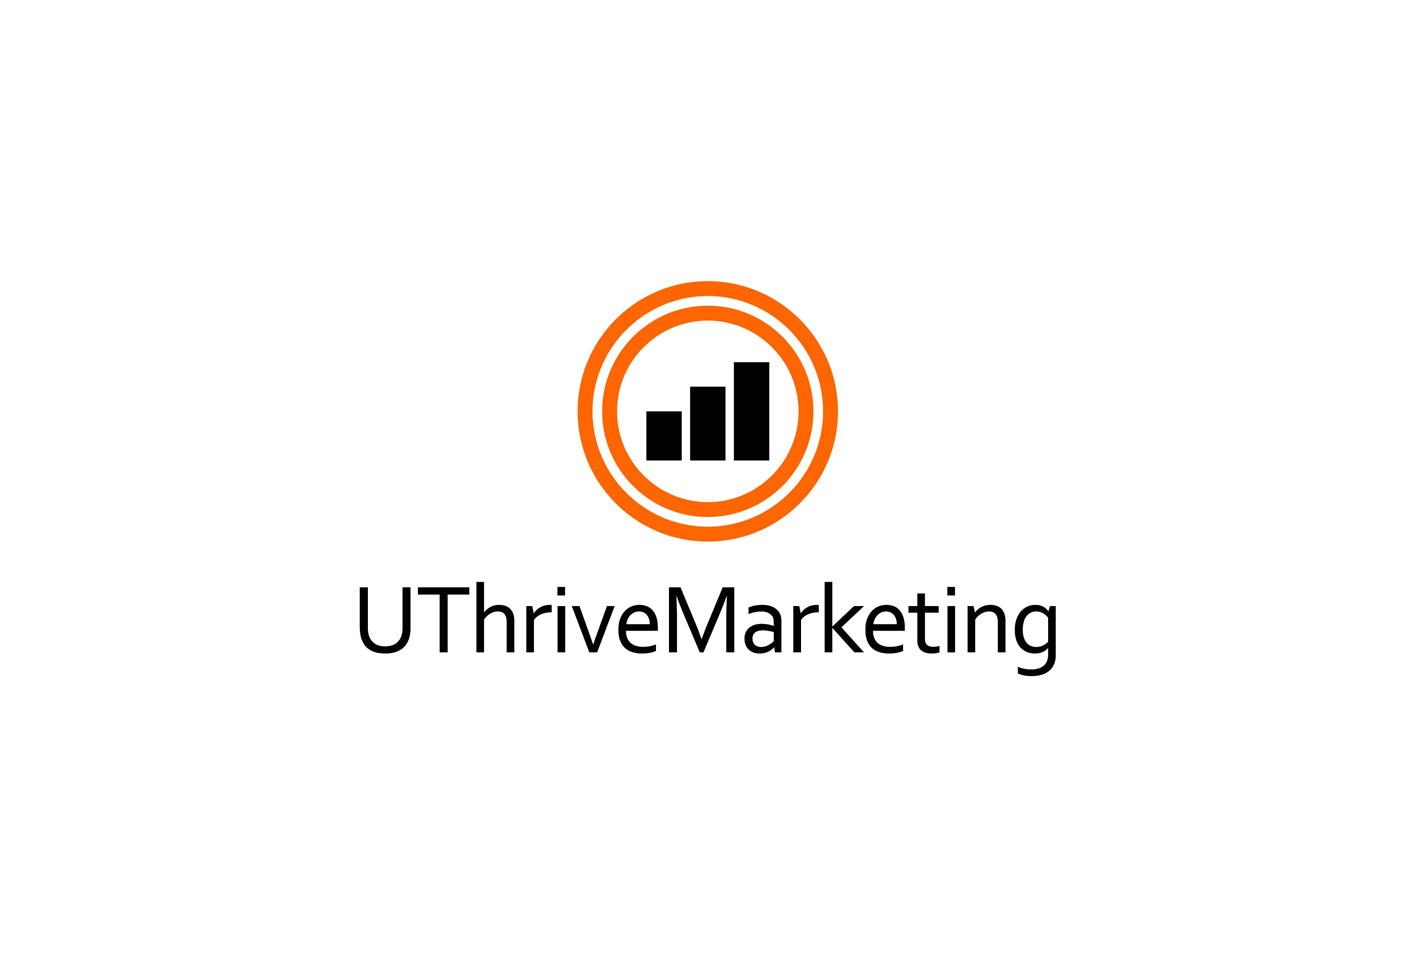 Uthrive Marketing Logo Design Tulsa